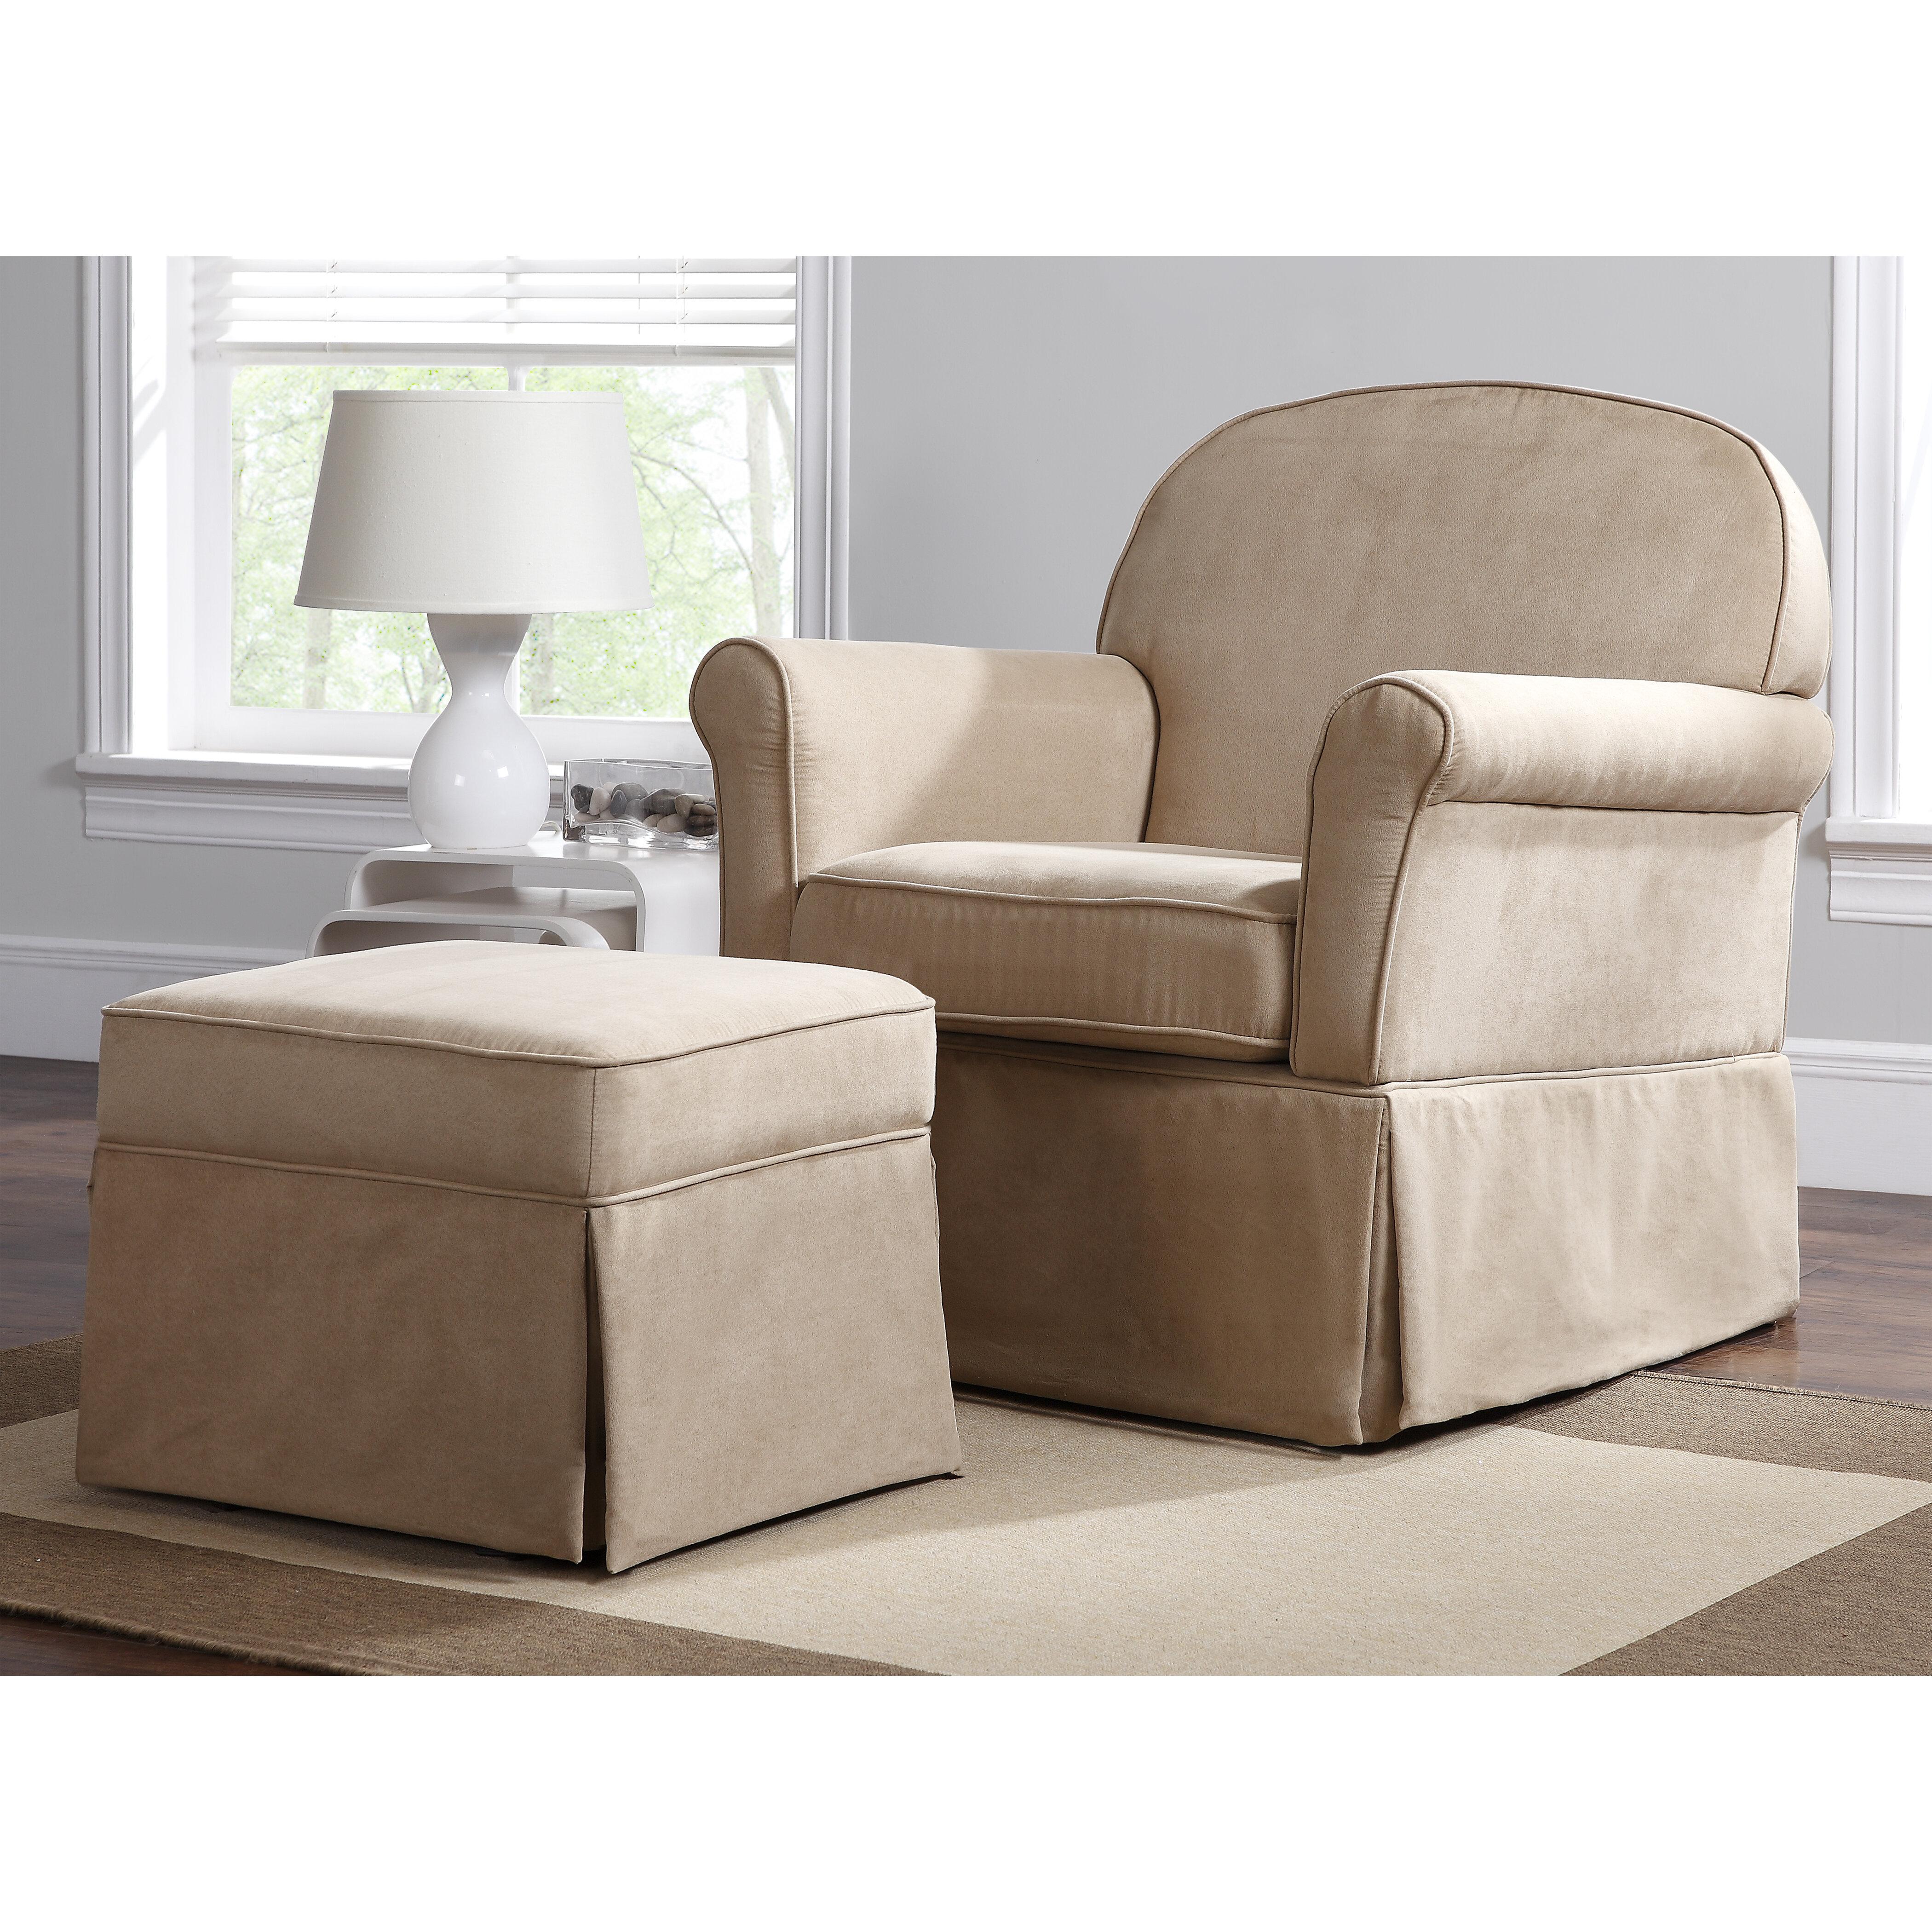 Surprising Polly Swivel Glider Ottoman Cjindustries Chair Design For Home Cjindustriesco